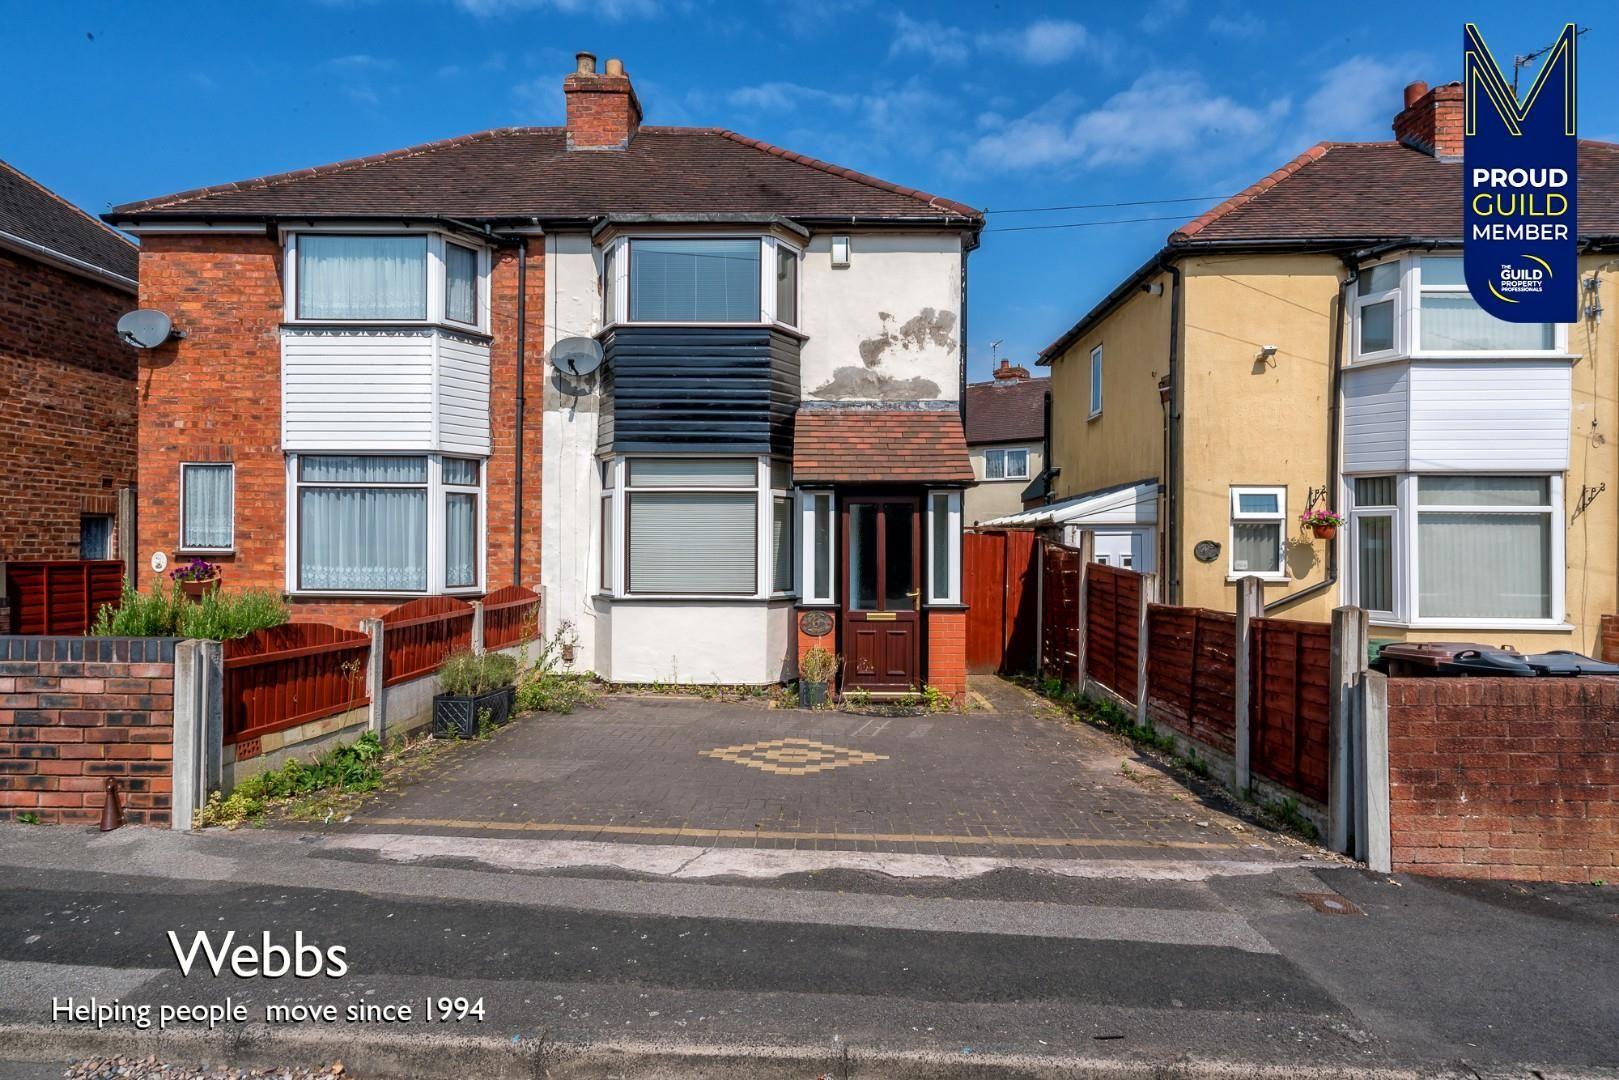 Property photo 1 of 15. © Webbs Estate Agents ©.Jpg